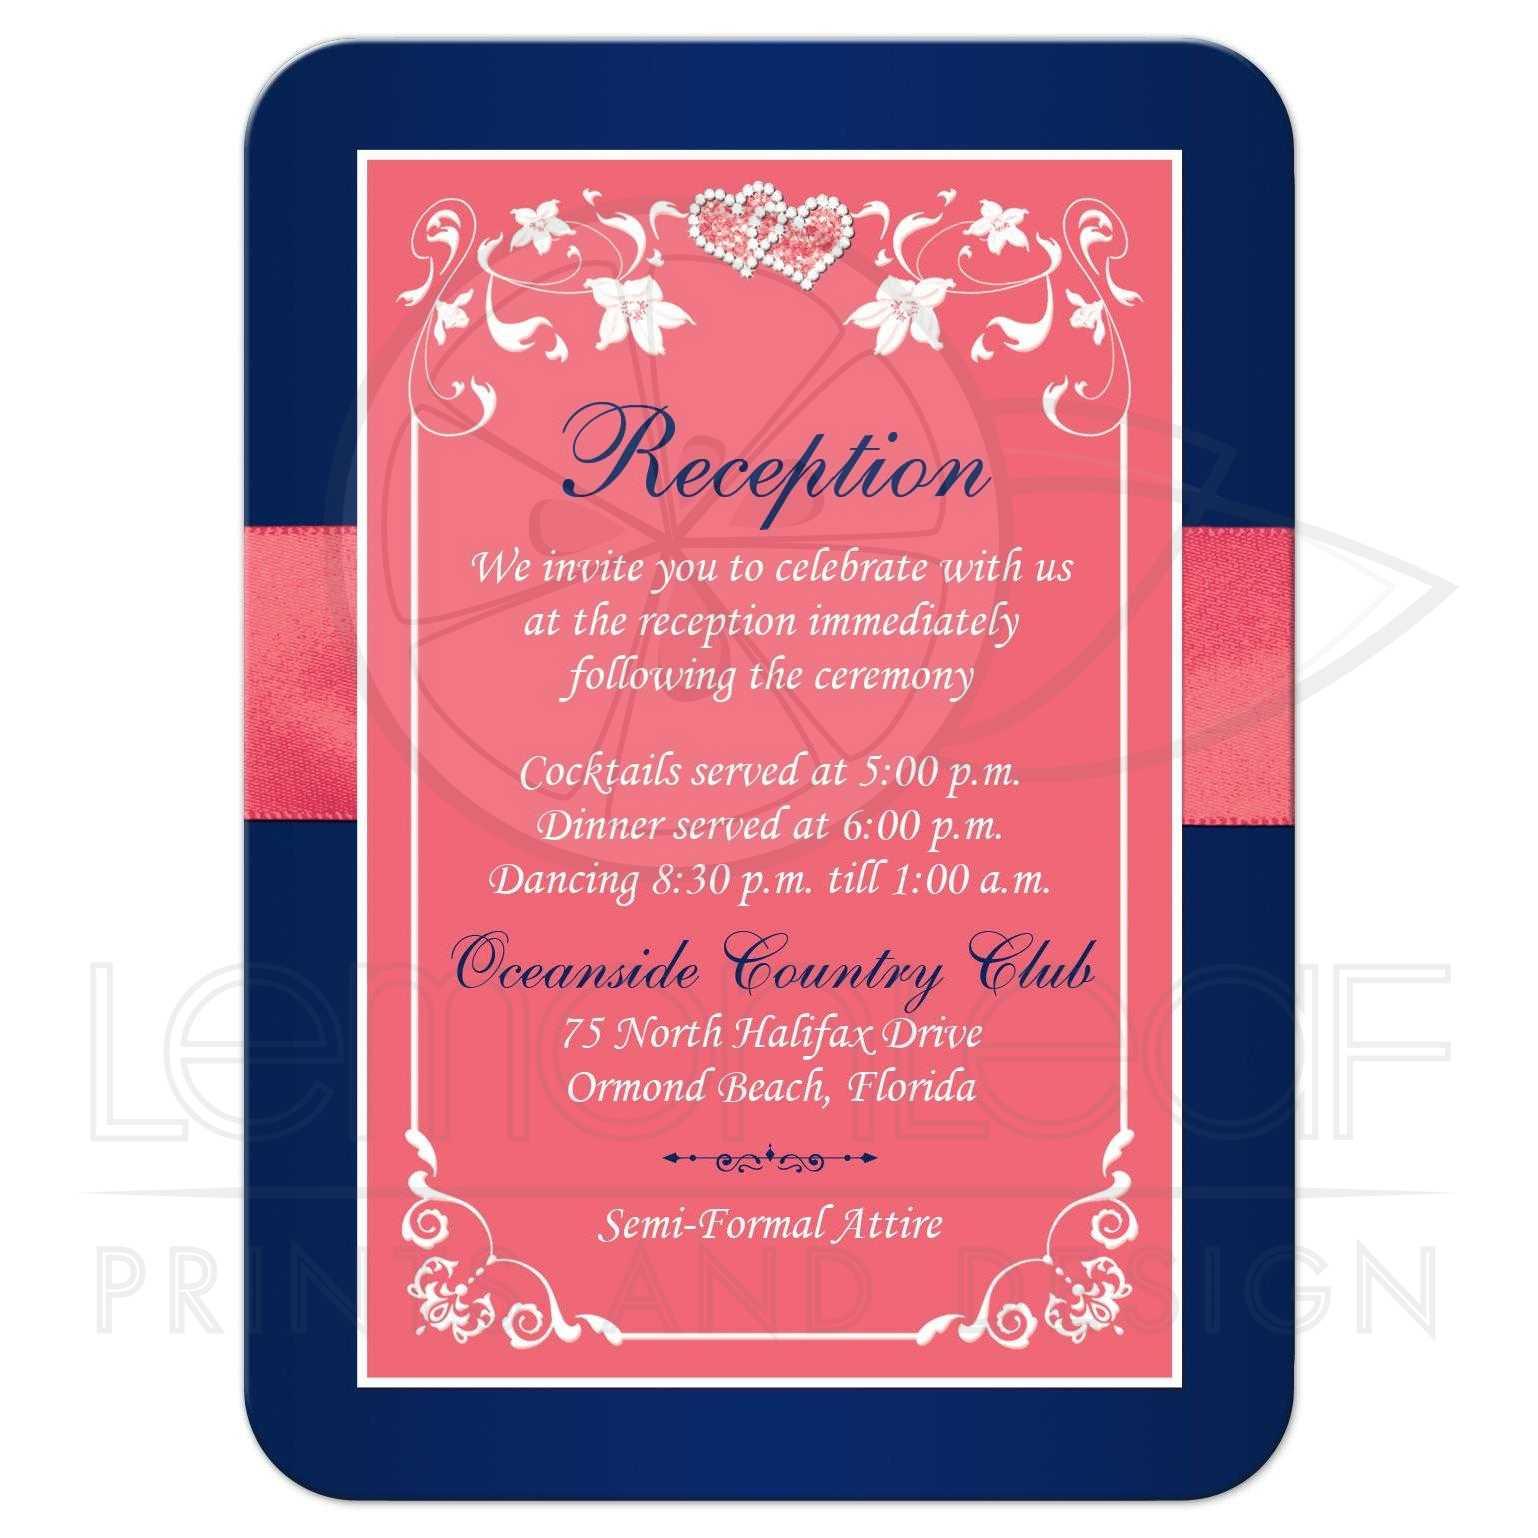 Wedding Reception Enclosure Card   Coral Pink, Navy Blue Printed ...